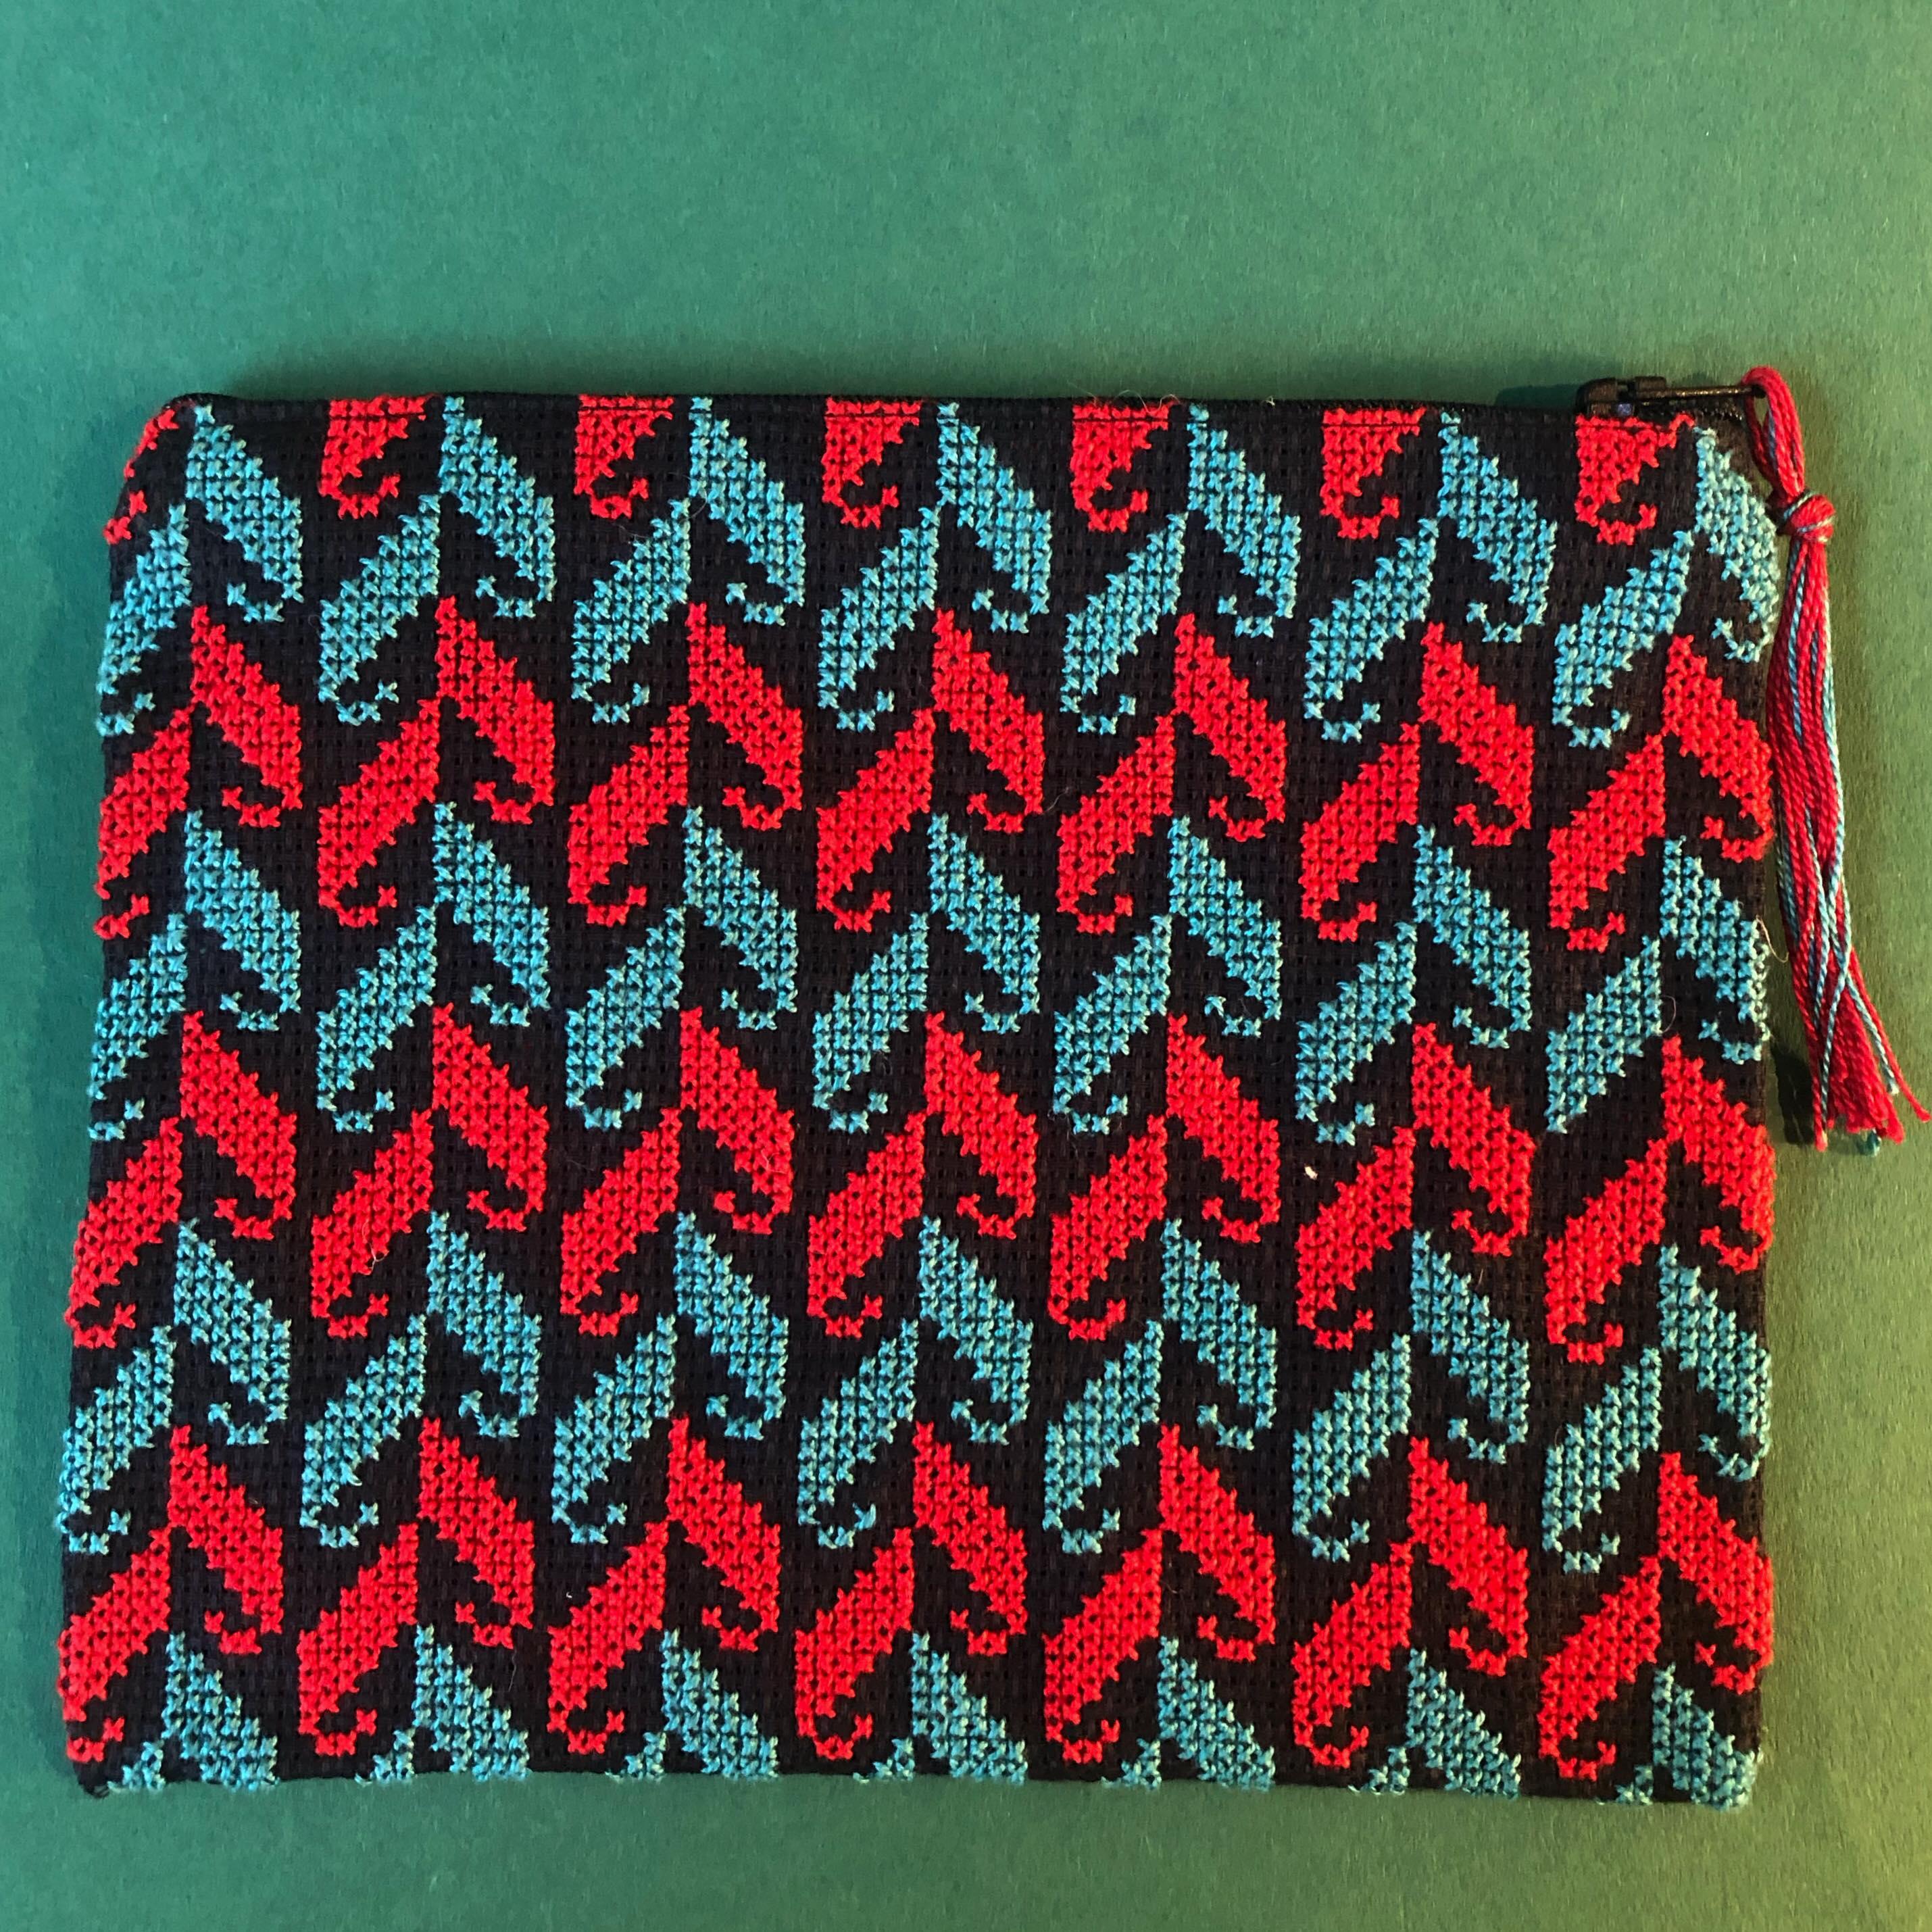 Stor brodert pung, svart, rød og blå